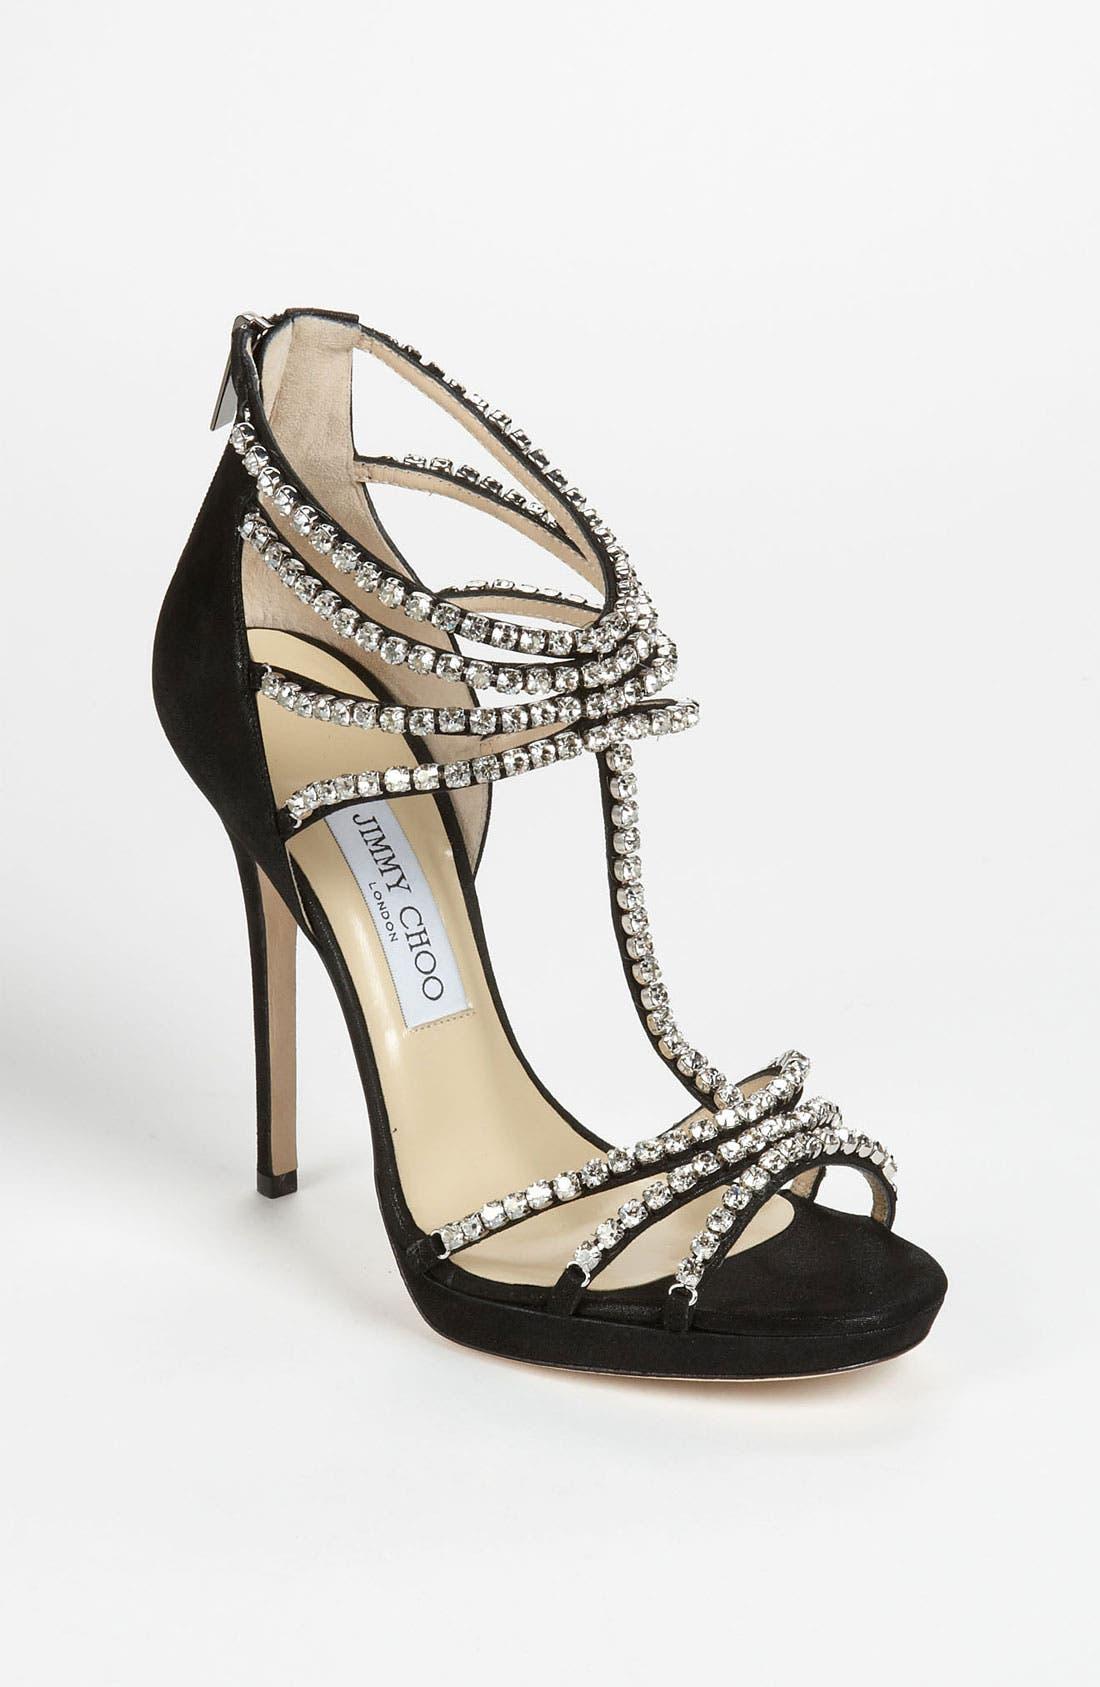 Alternate Image 1 Selected - Jimmy Choo 'Kera' Platform Sandal